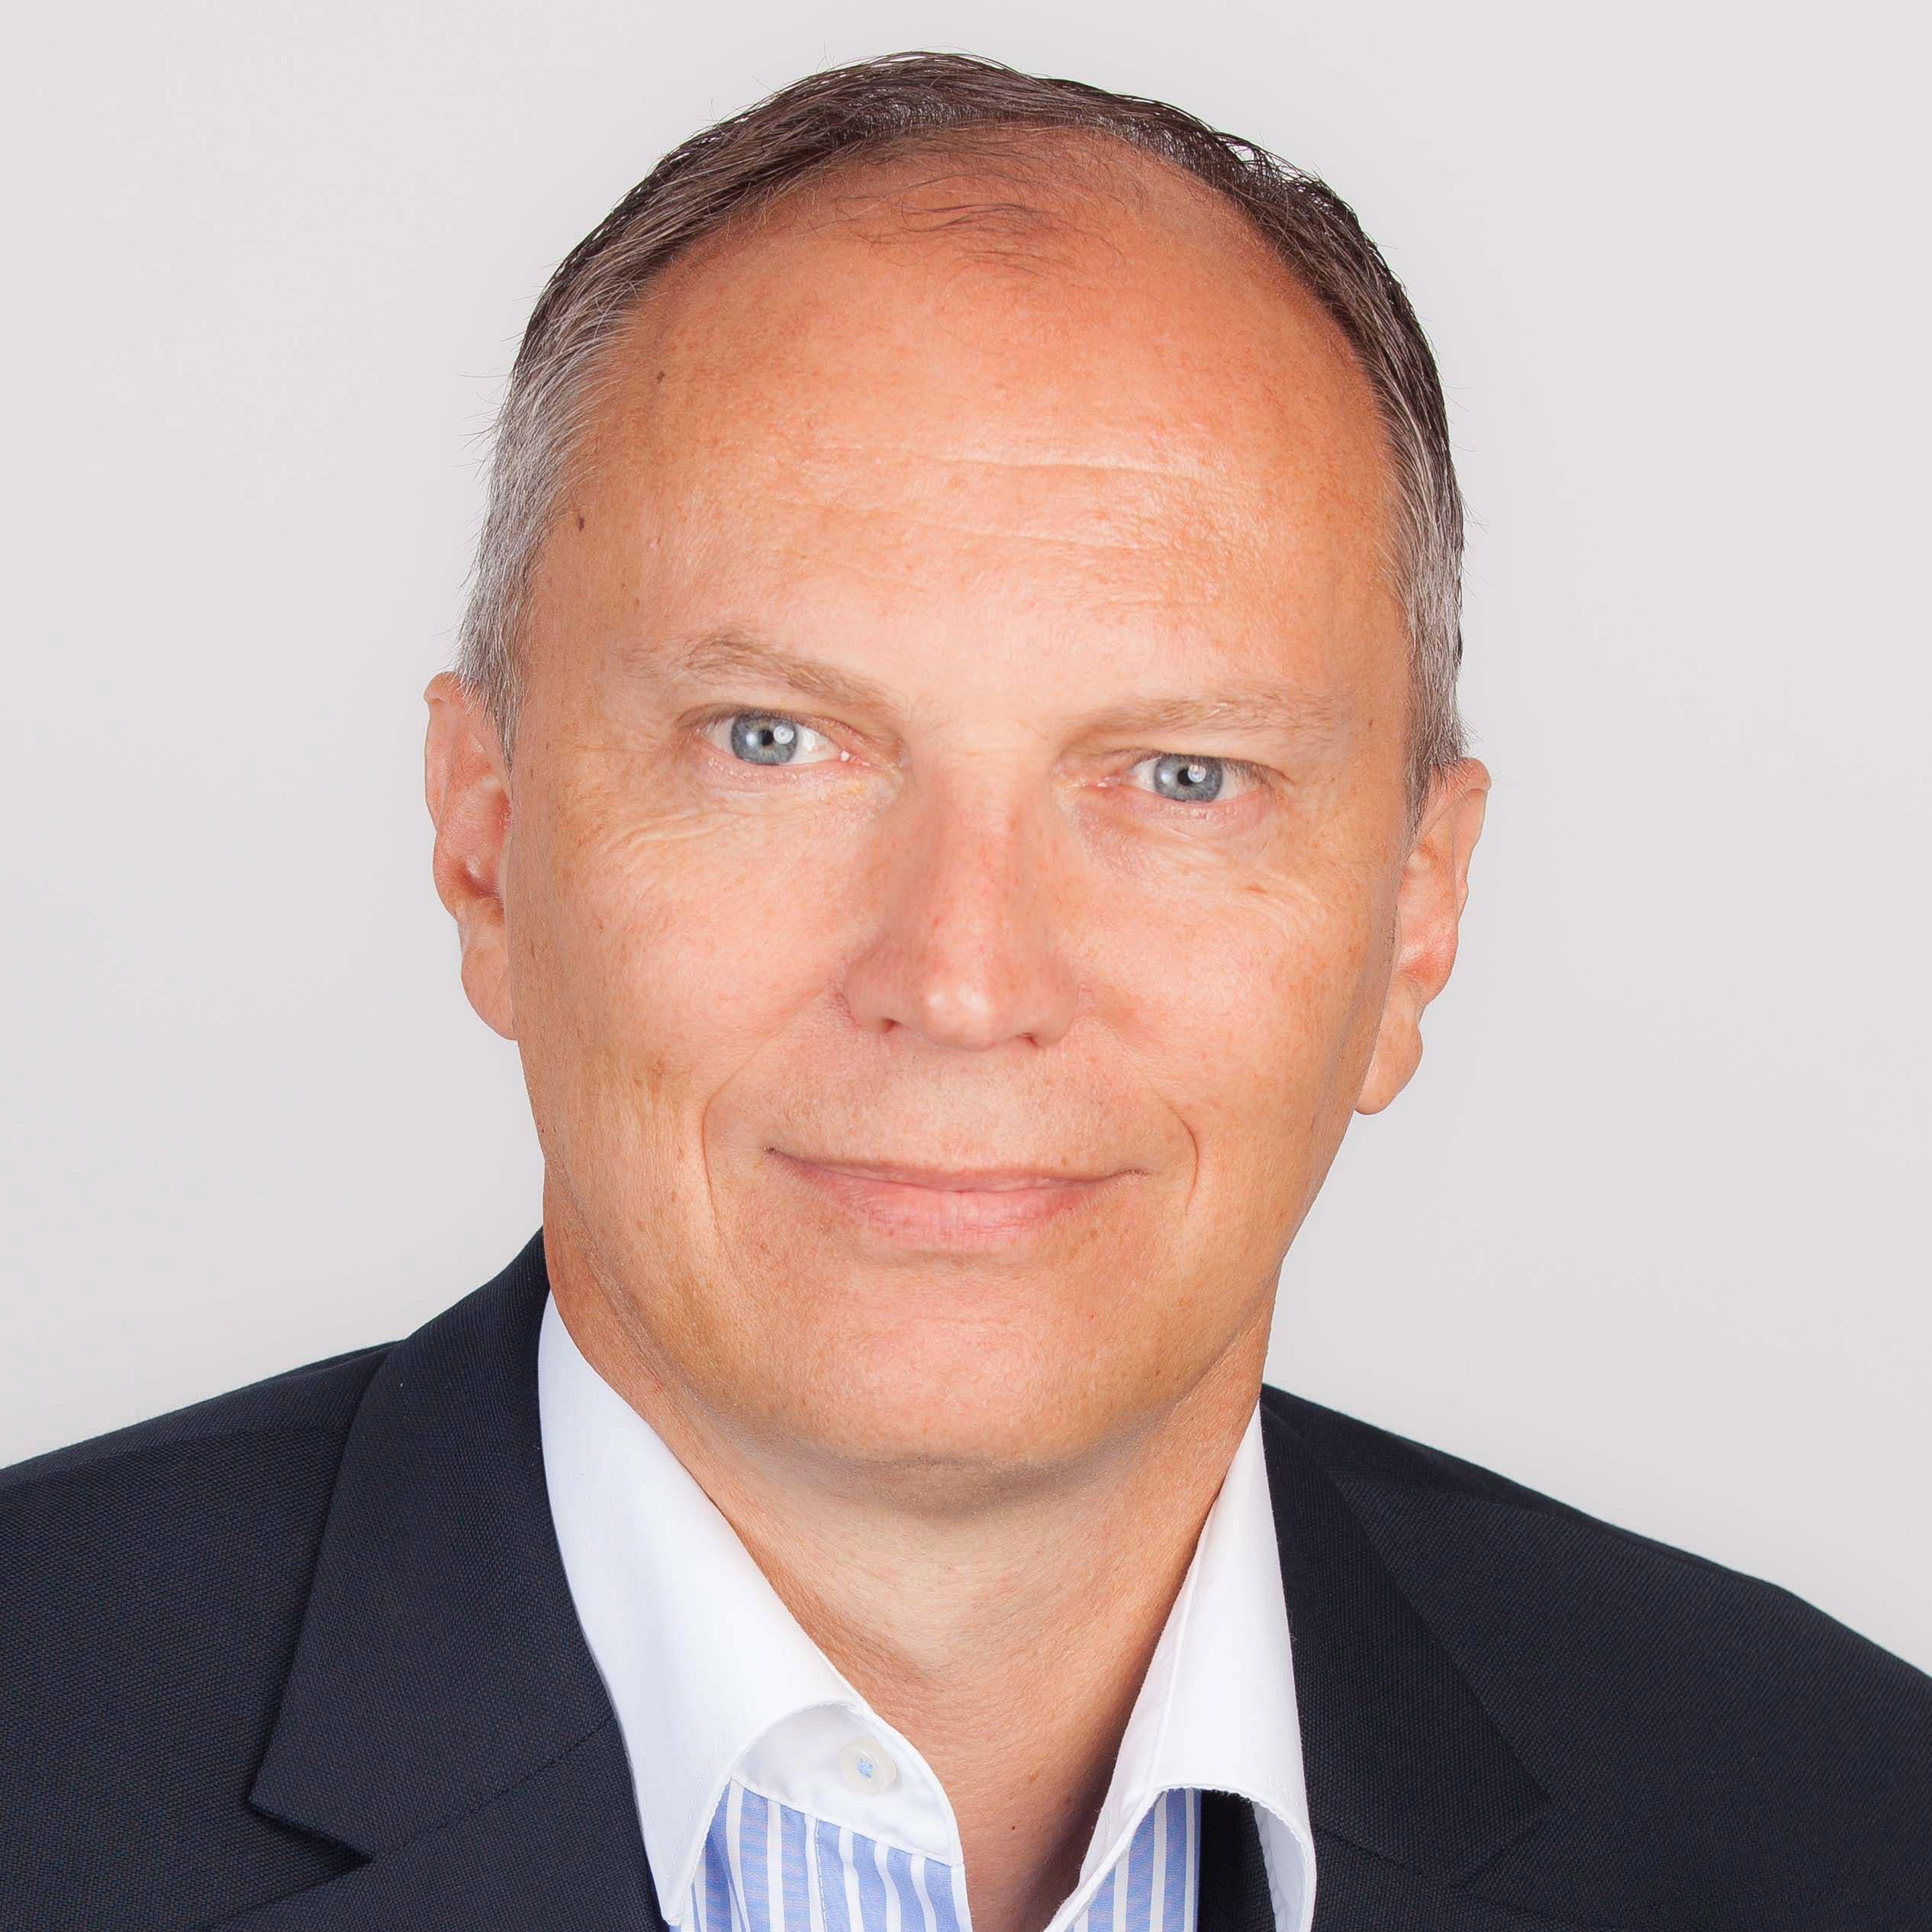 Tritt zurück: Andreas Muff (parteilos).